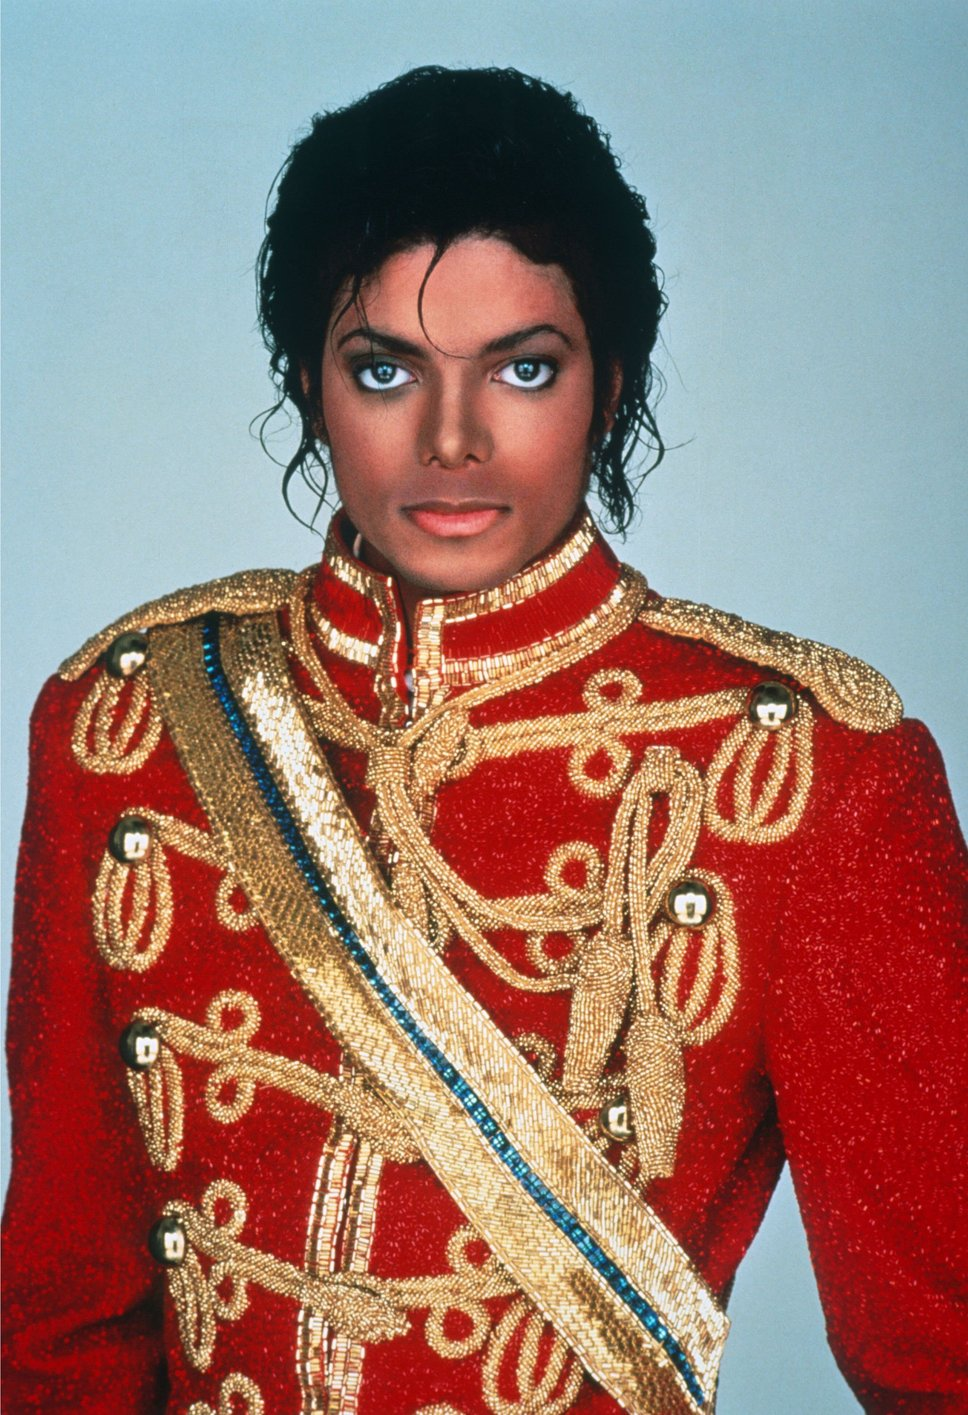 king_of_pop_michael_jackson_tu